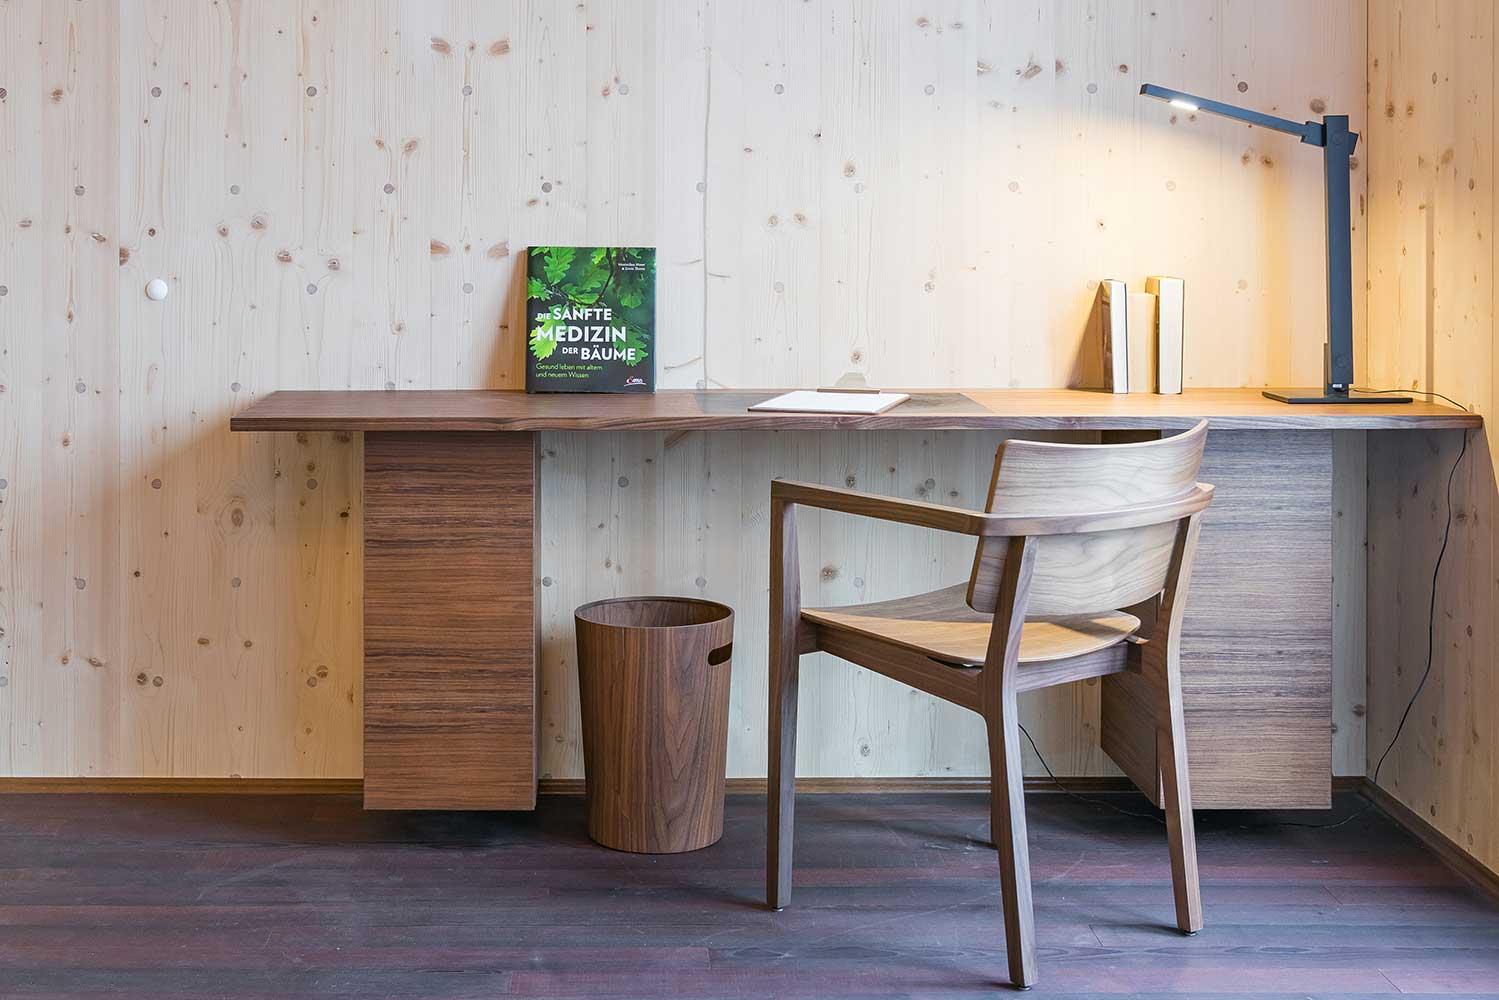 neubau holzh user massivholz meyer binning ruhland architekten dresden. Black Bedroom Furniture Sets. Home Design Ideas